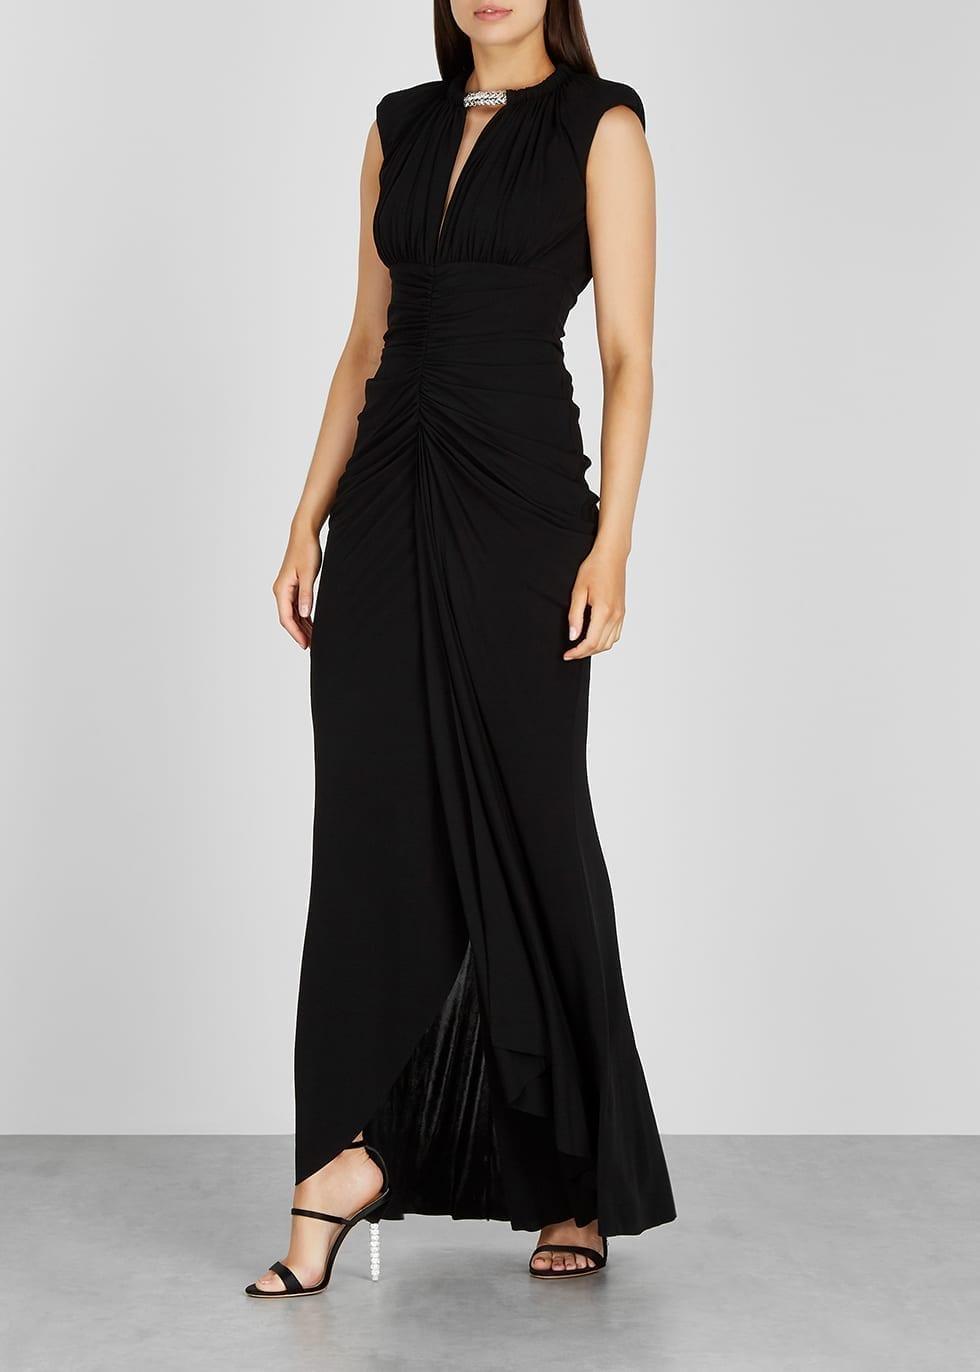 ALEXANDER MCQUEEN Black Crystal-embellished Jersey Gown